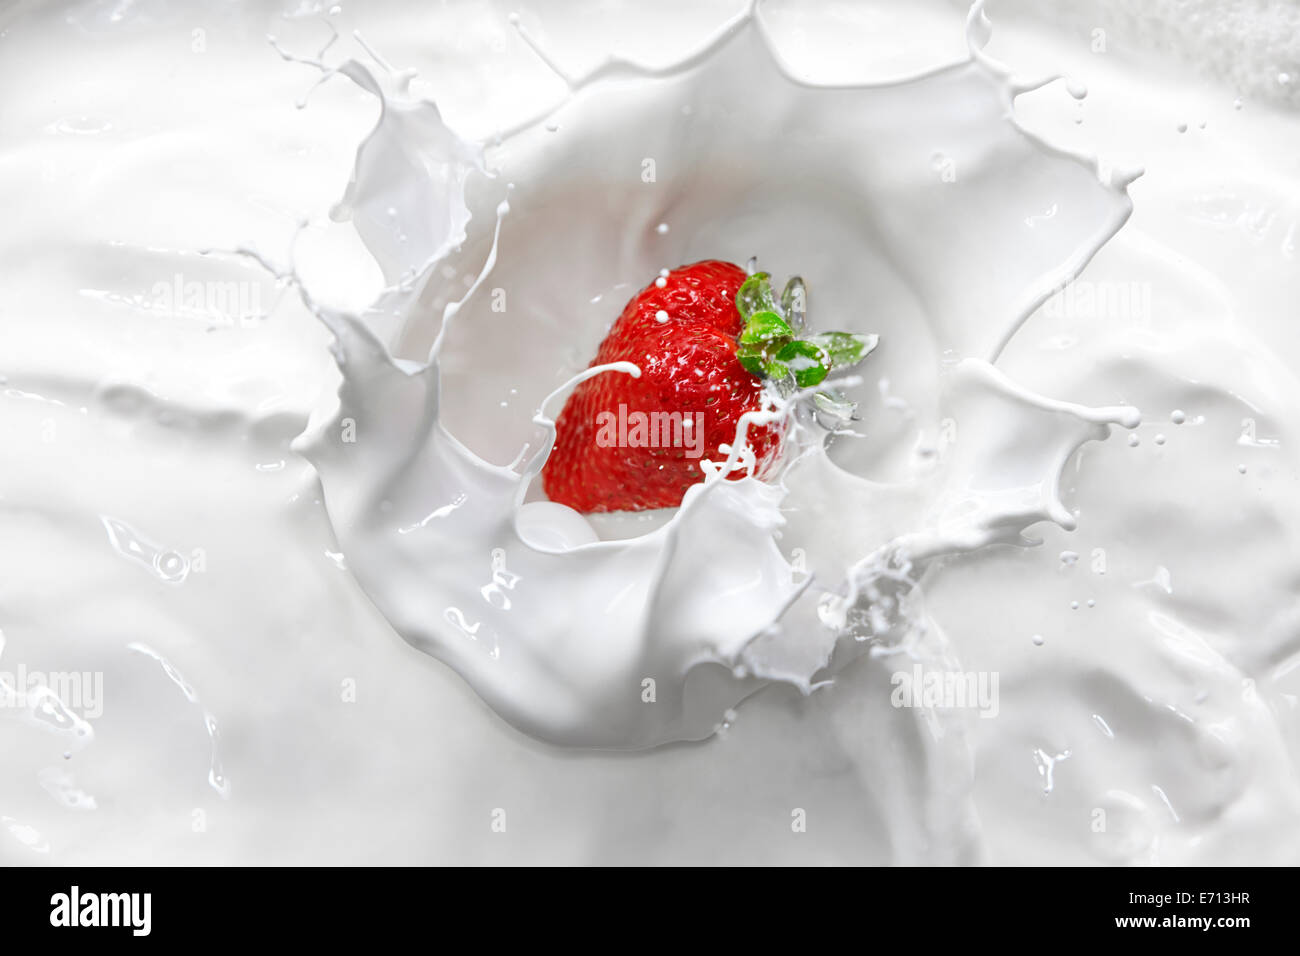 Salpicar la crema de fresas Imagen De Stock